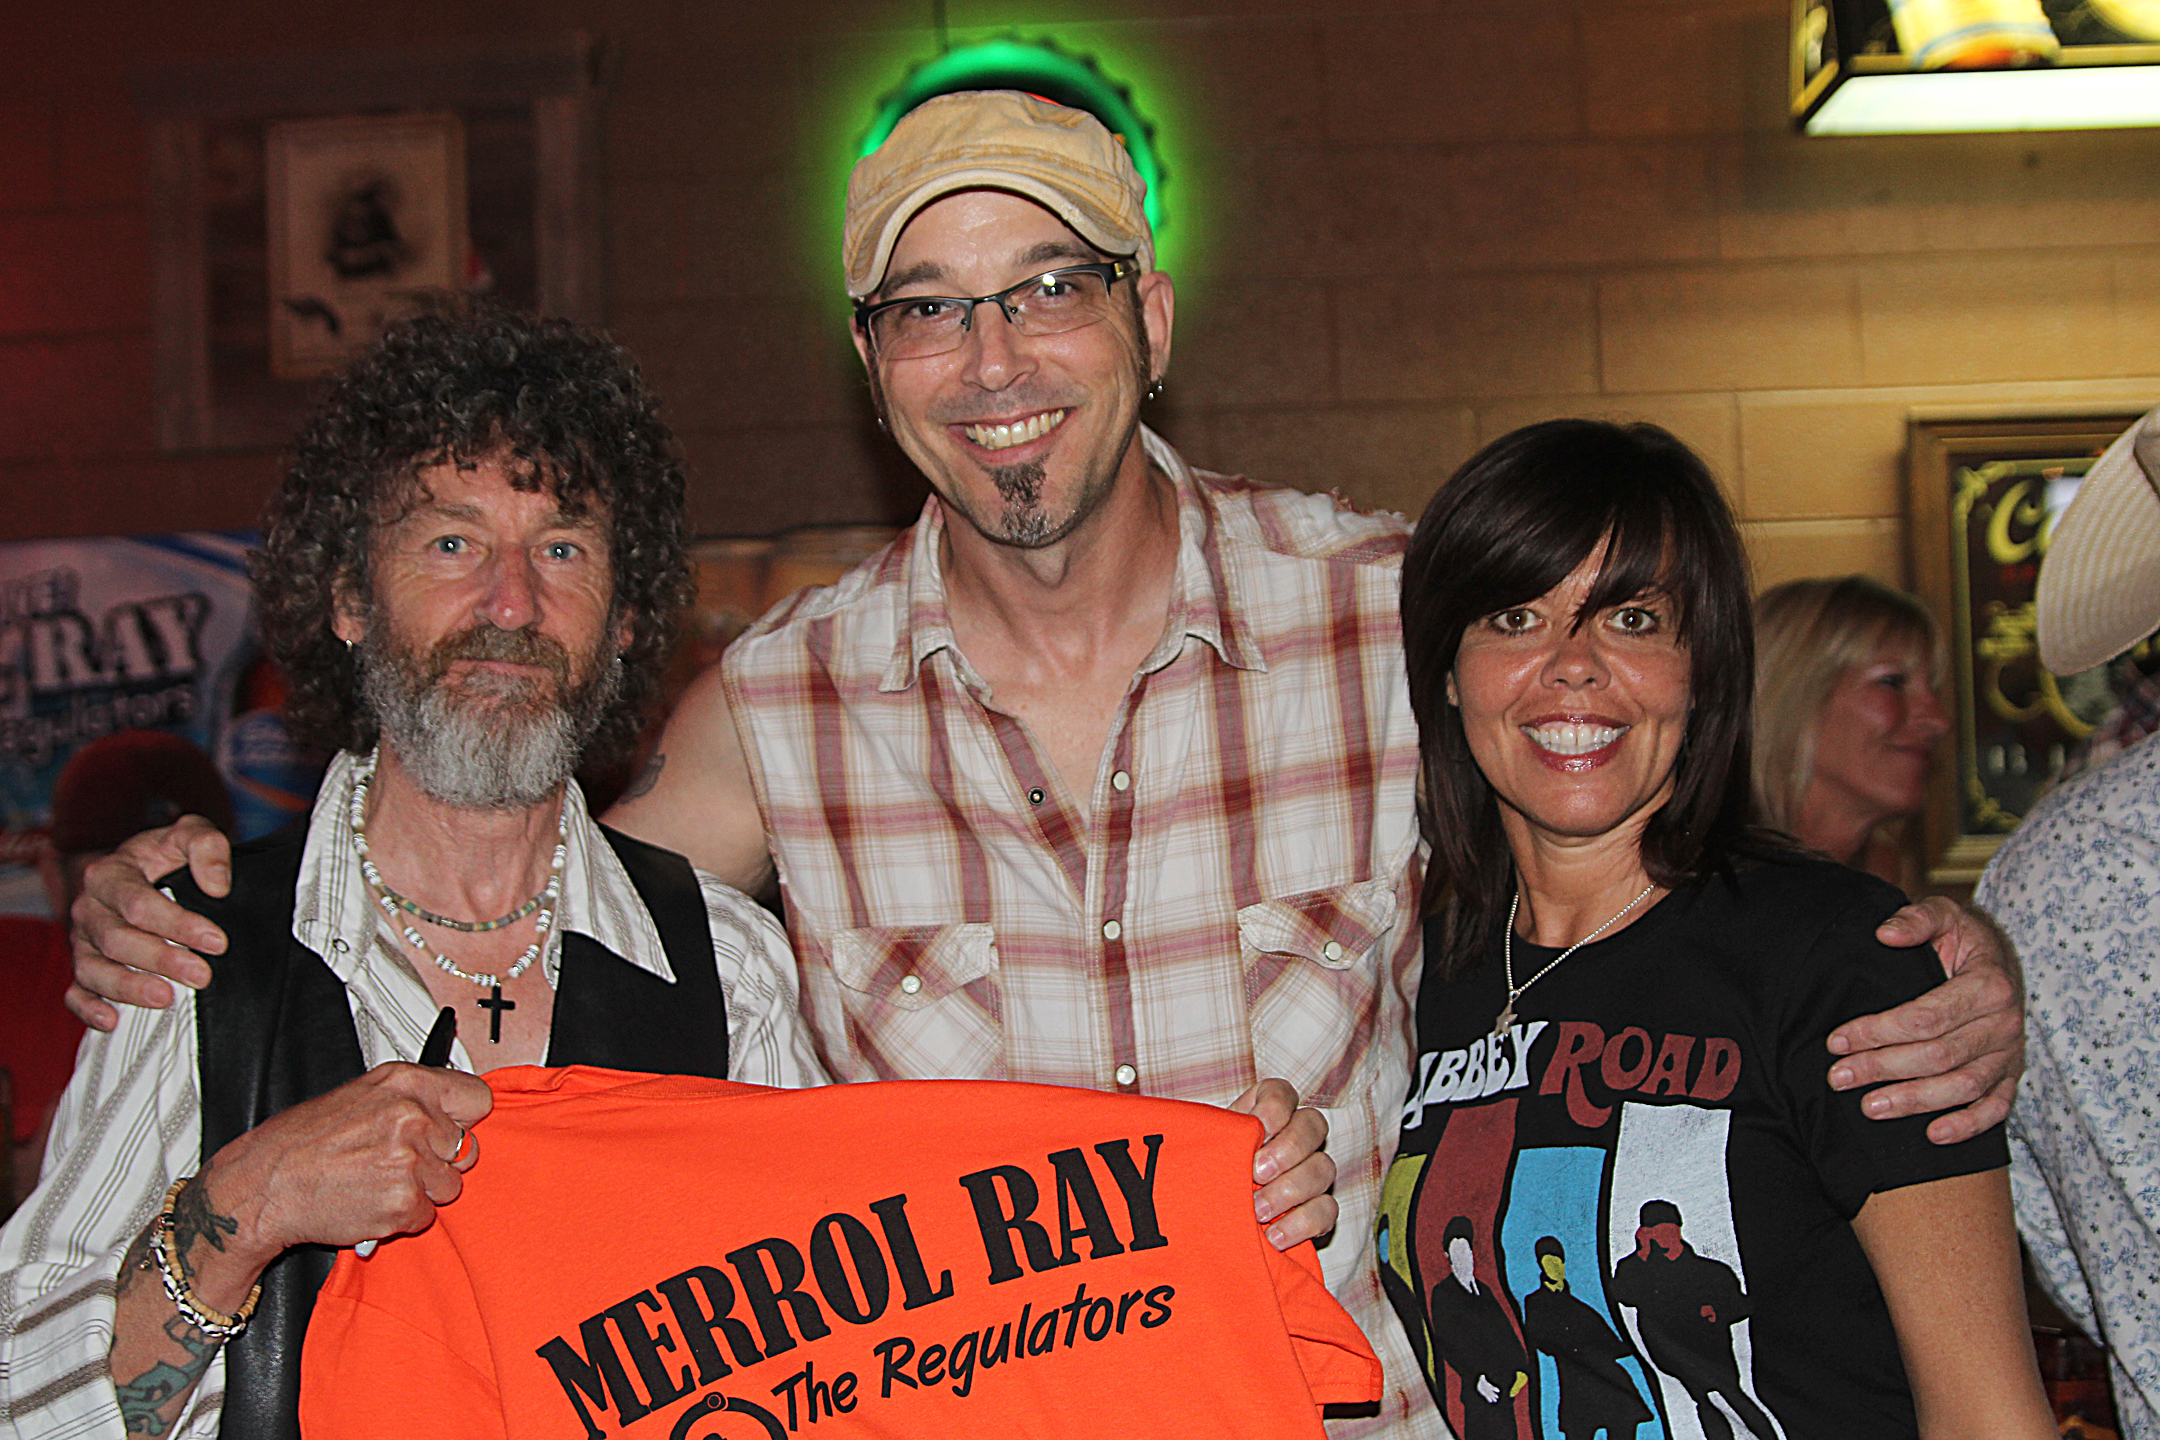 Merrol Ray & The Regulators, 9.8.12